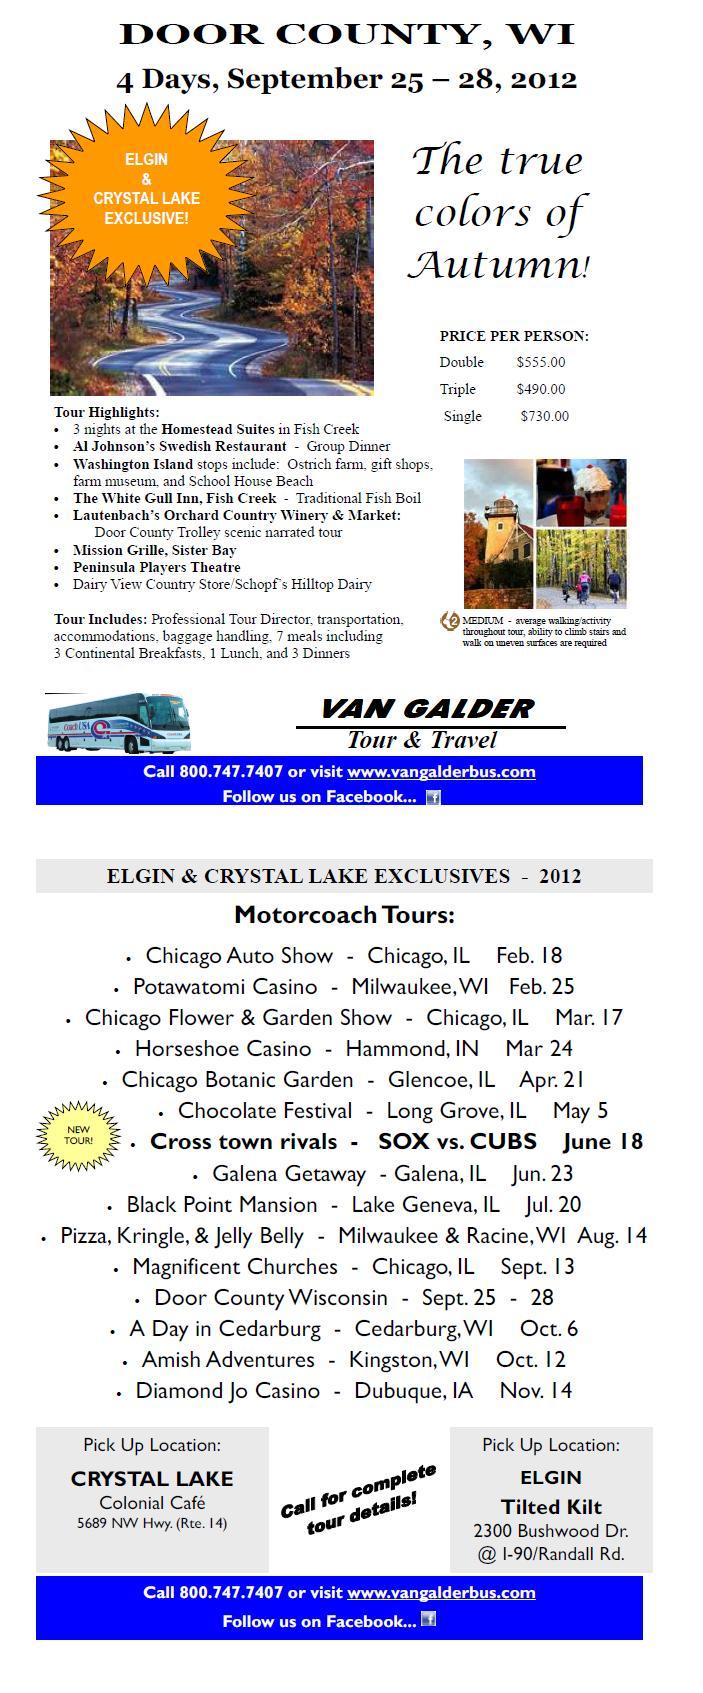 Van Galder Bus Company | NEW Crystal Lake & Elgin, IL Tour Departures